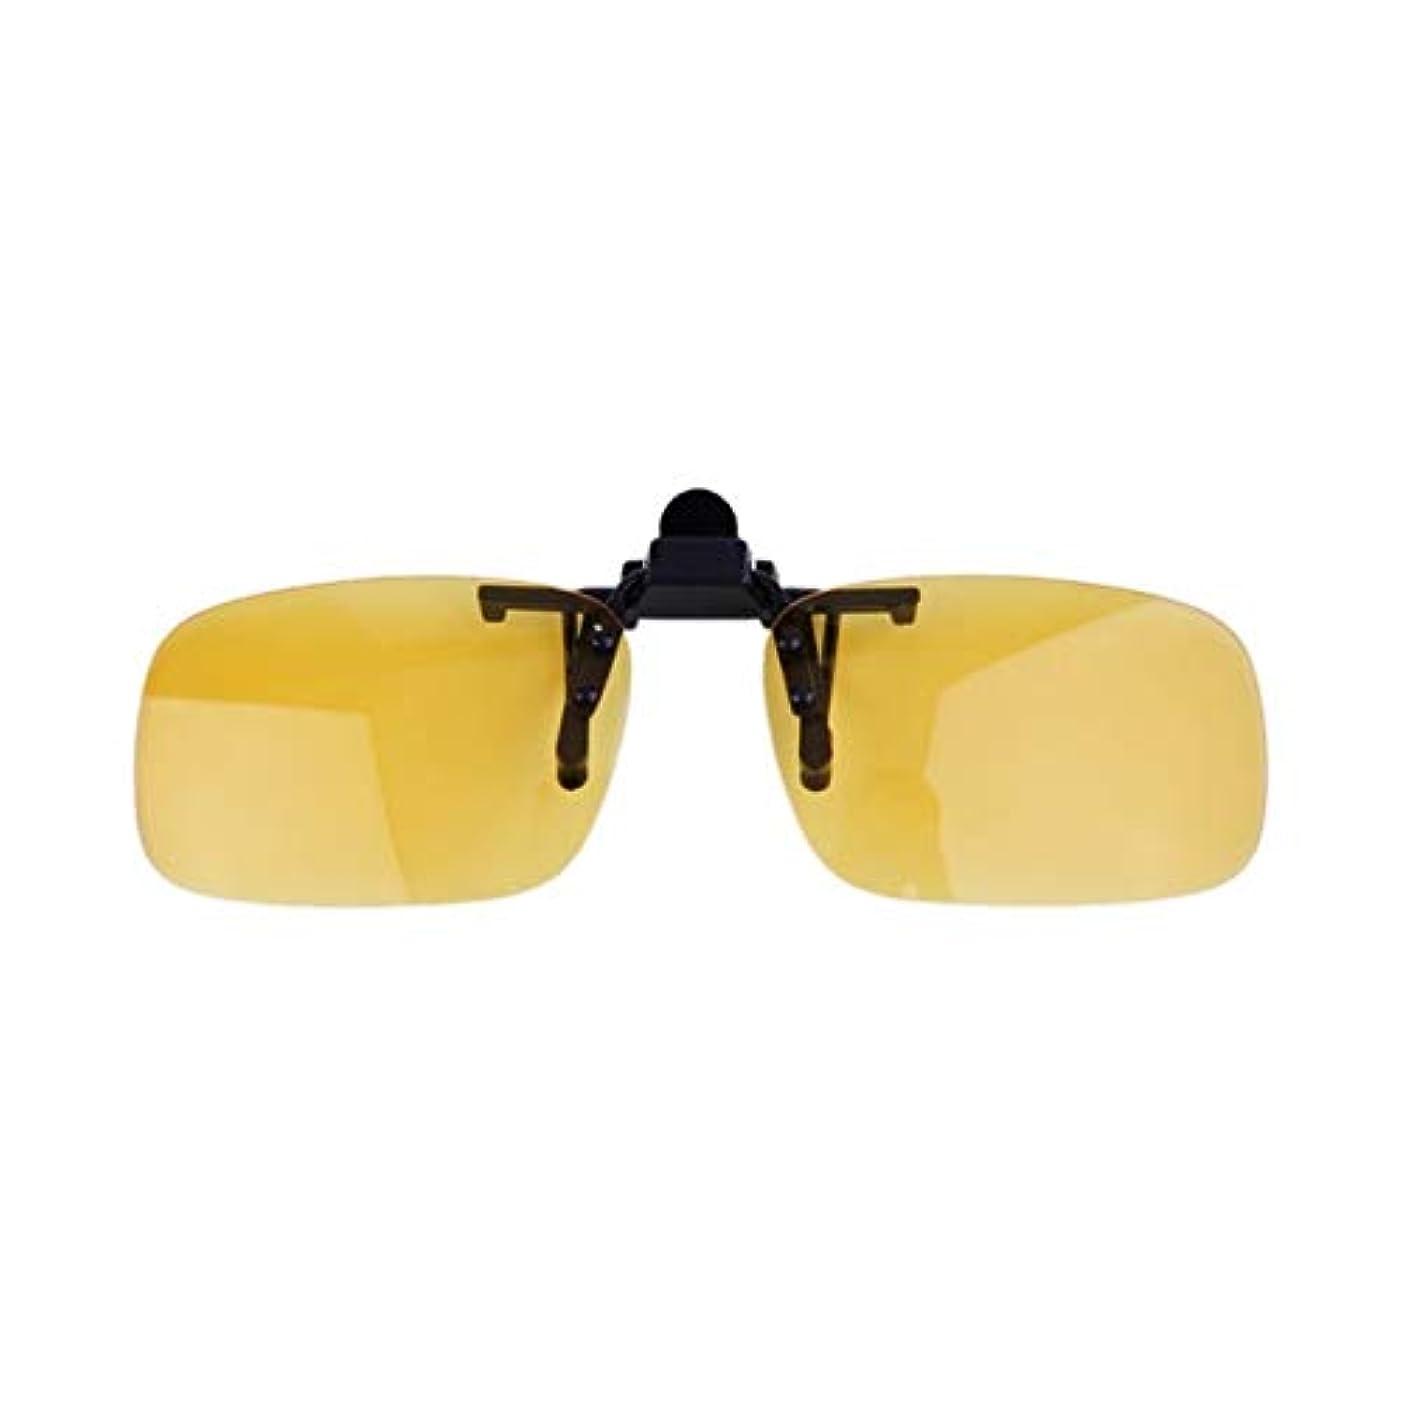 DeeploveUU ドライビングナイトビジョンクリップオンフリップアップレンズサングラスクールアイウェアクリップオンレンズAnti-UV 400男女兼用用